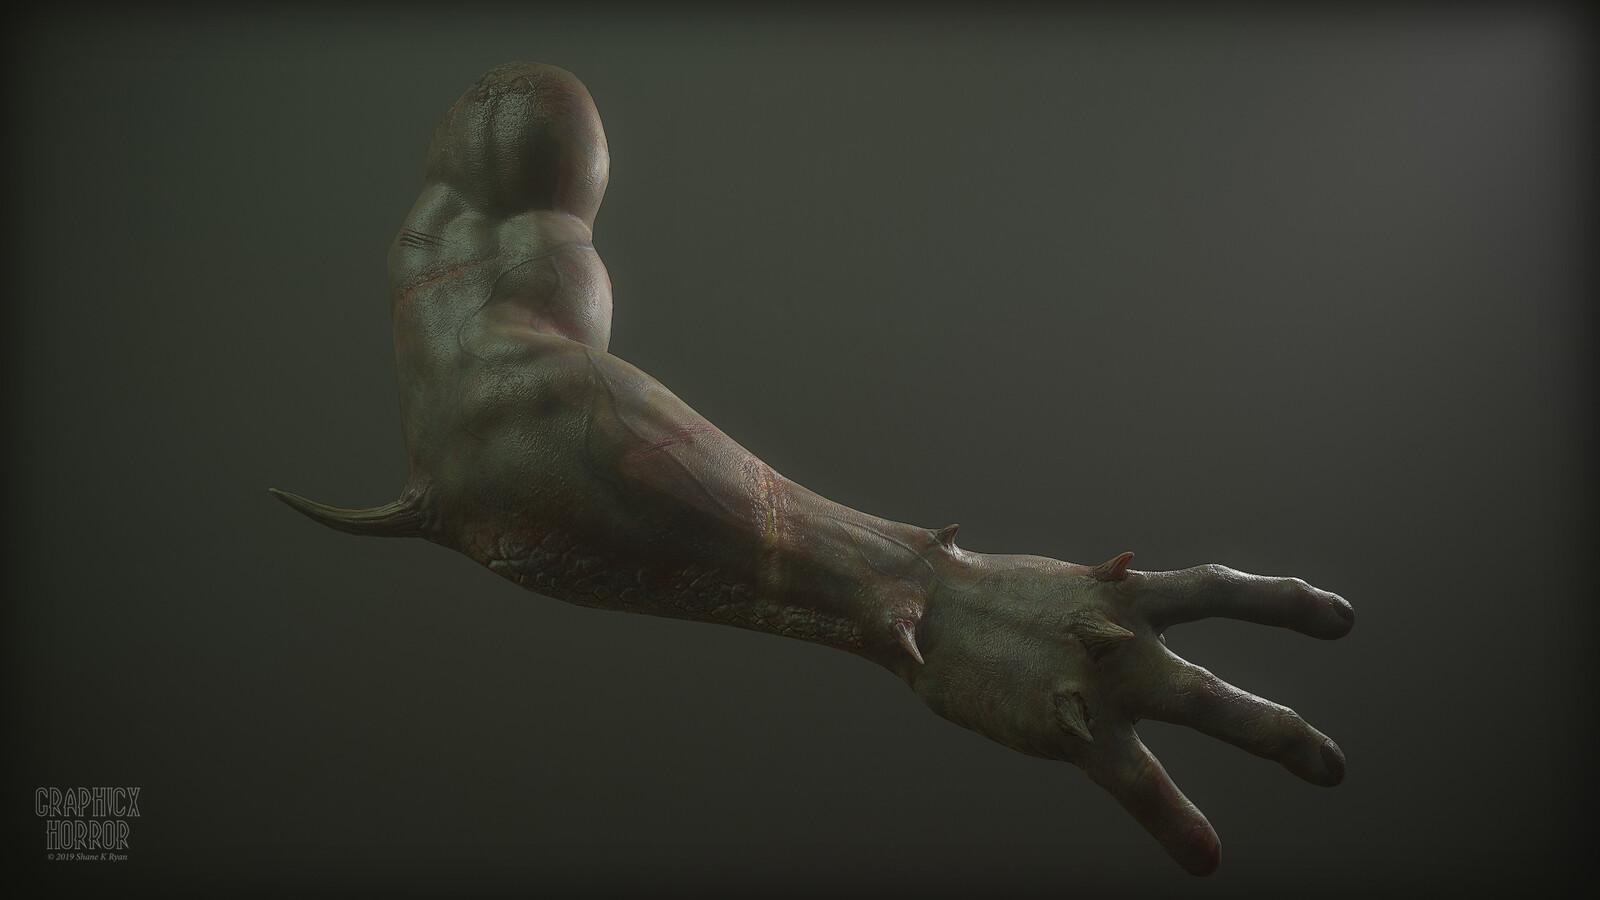 Arm Anatomy Study - Demon, Ogre and Human